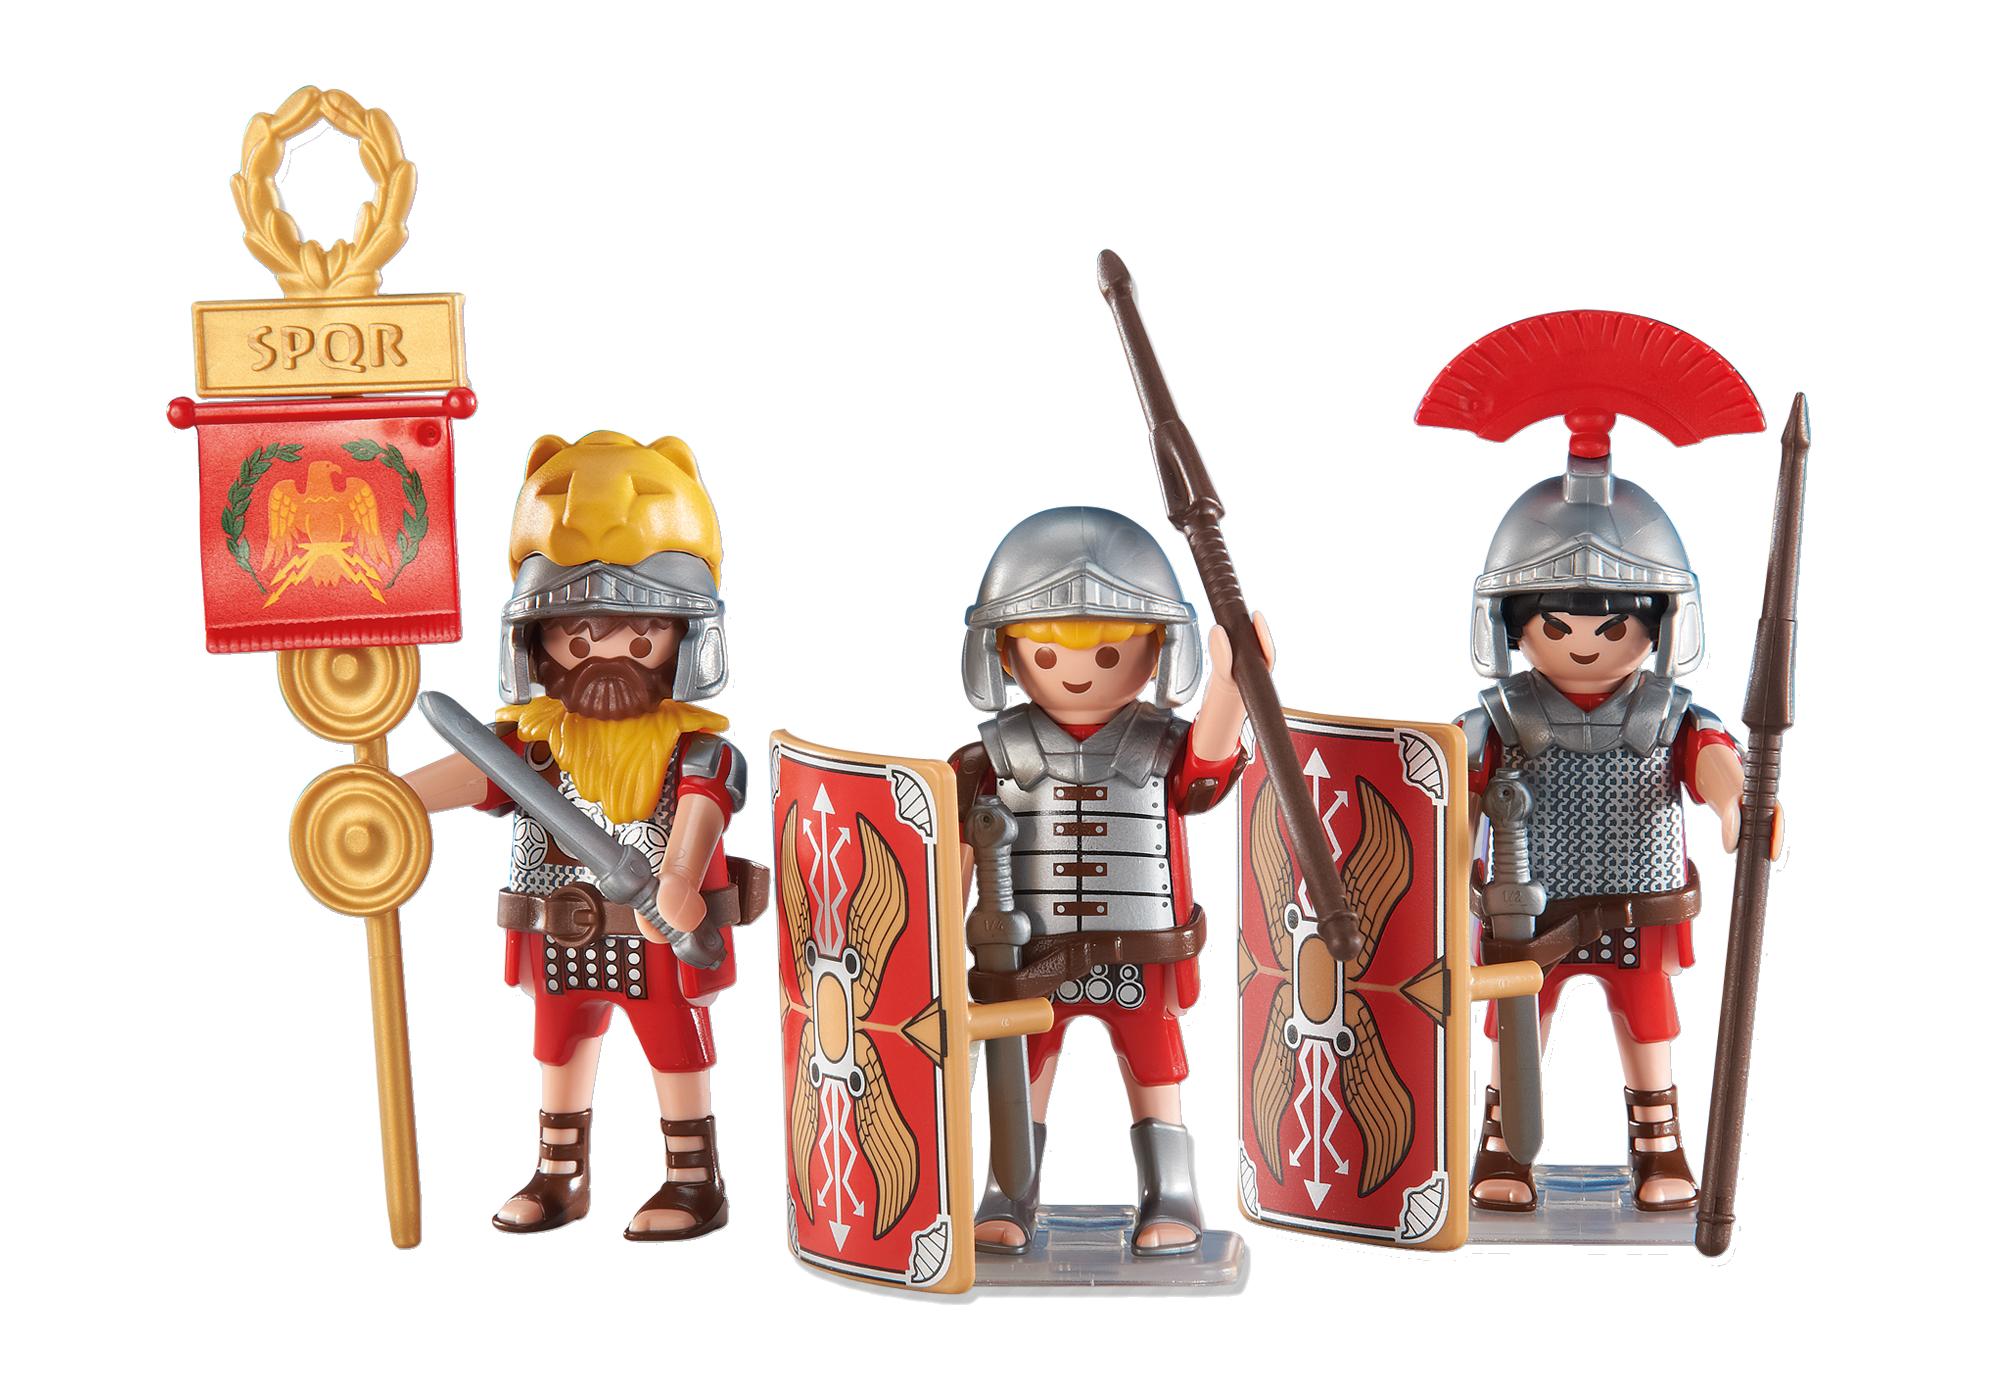 http://media.playmobil.com/i/playmobil/6490_product_detail/3 romerske soldater